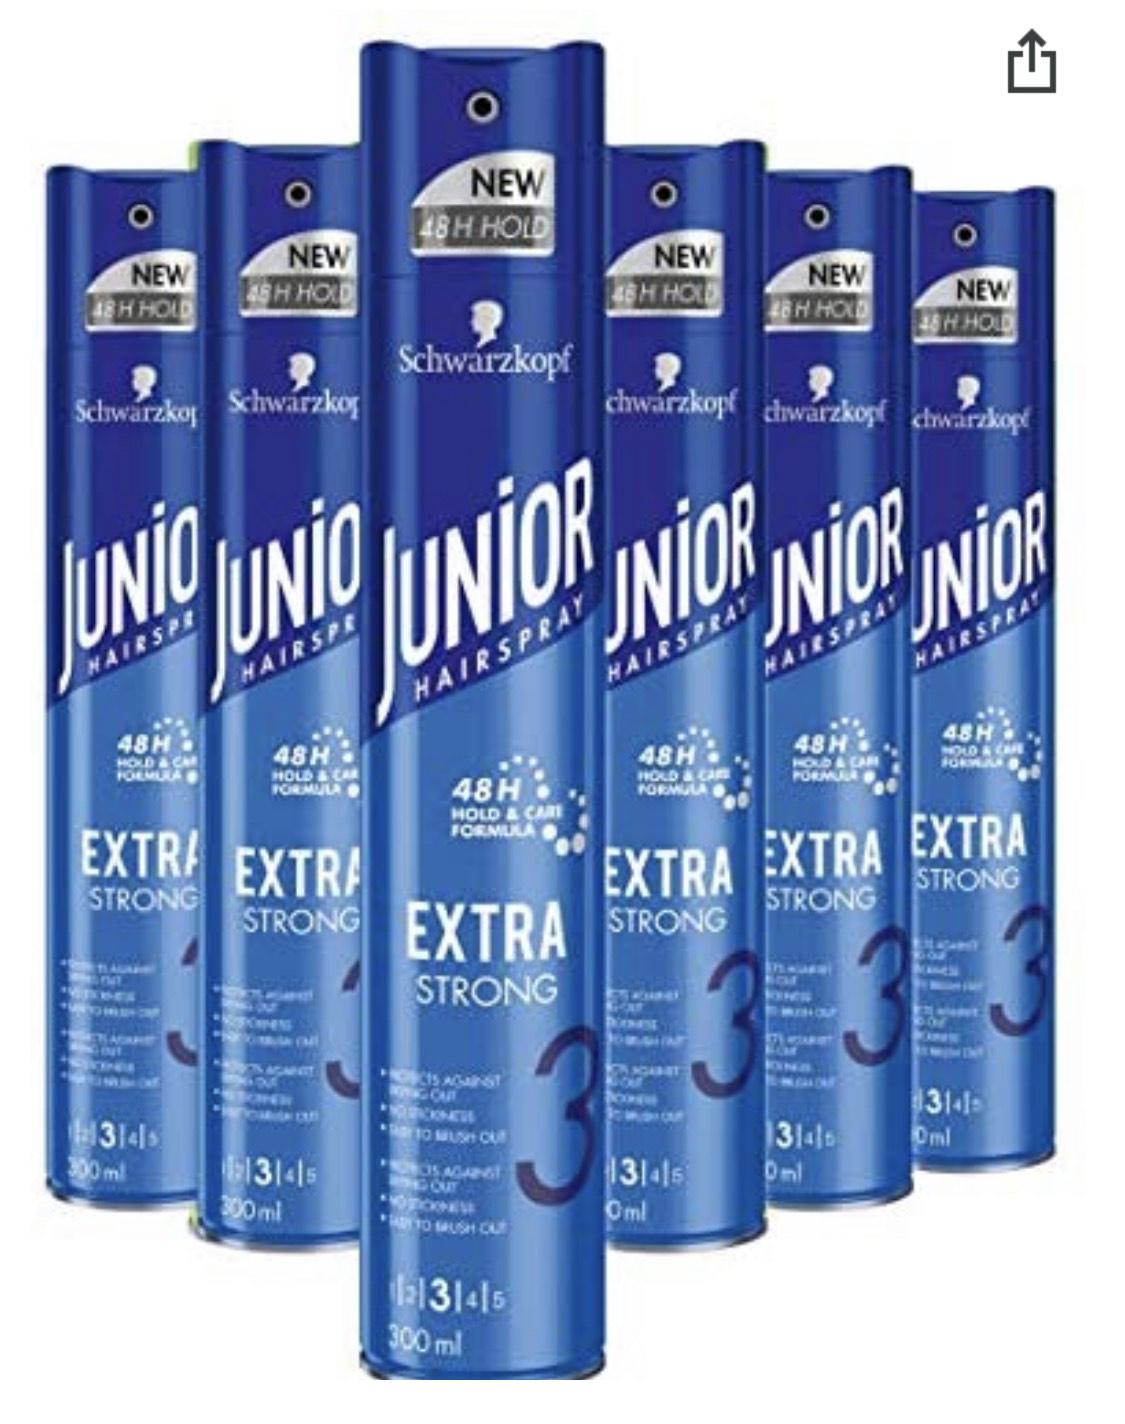 Schwarzkopf Junior Hairspray Extra Strong Haarspray 300ml , 6 stuks @ Amazon.nl